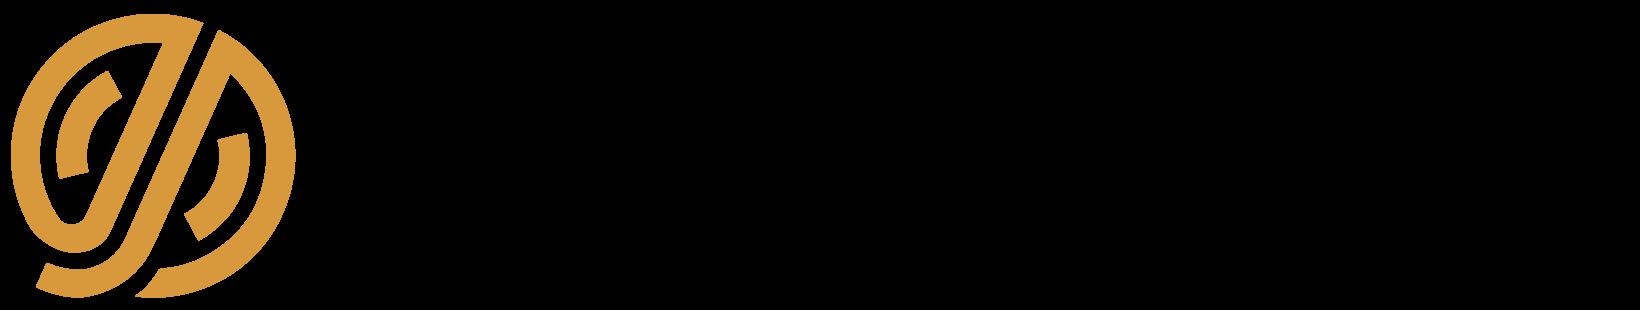 Jaksomedia